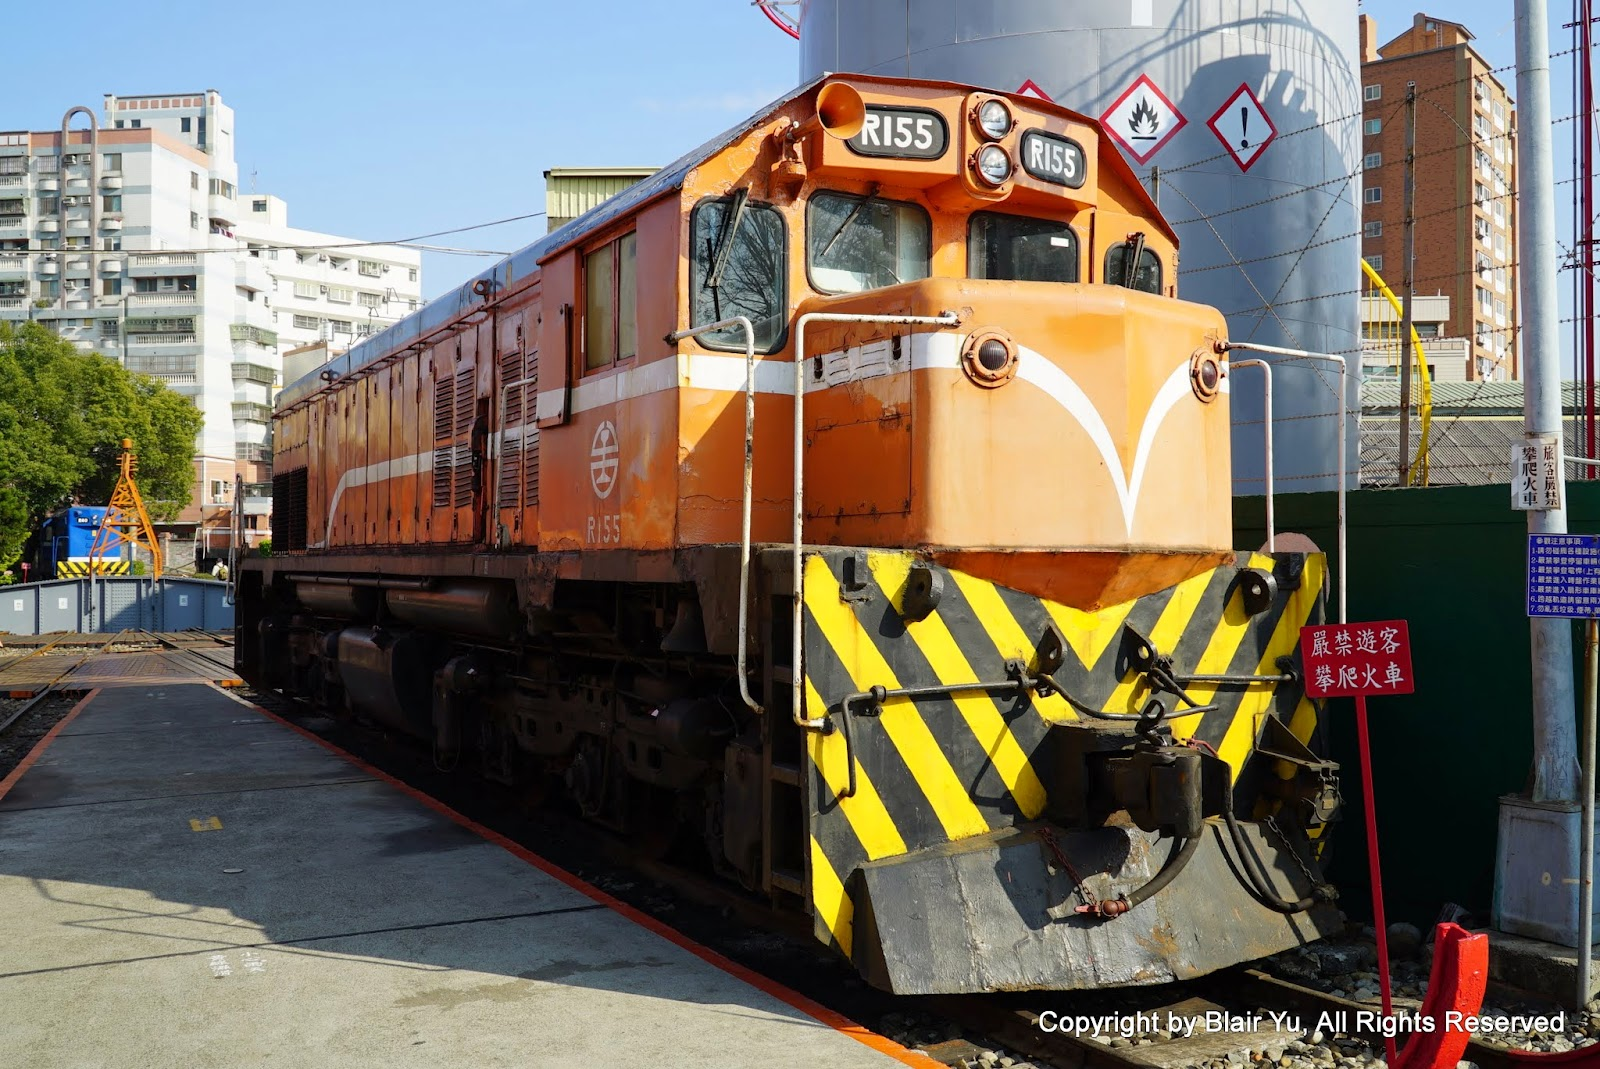 Blair's 鐵道攝影: R155柴電機車 / TRA R155 Diesel-electric Locomotive